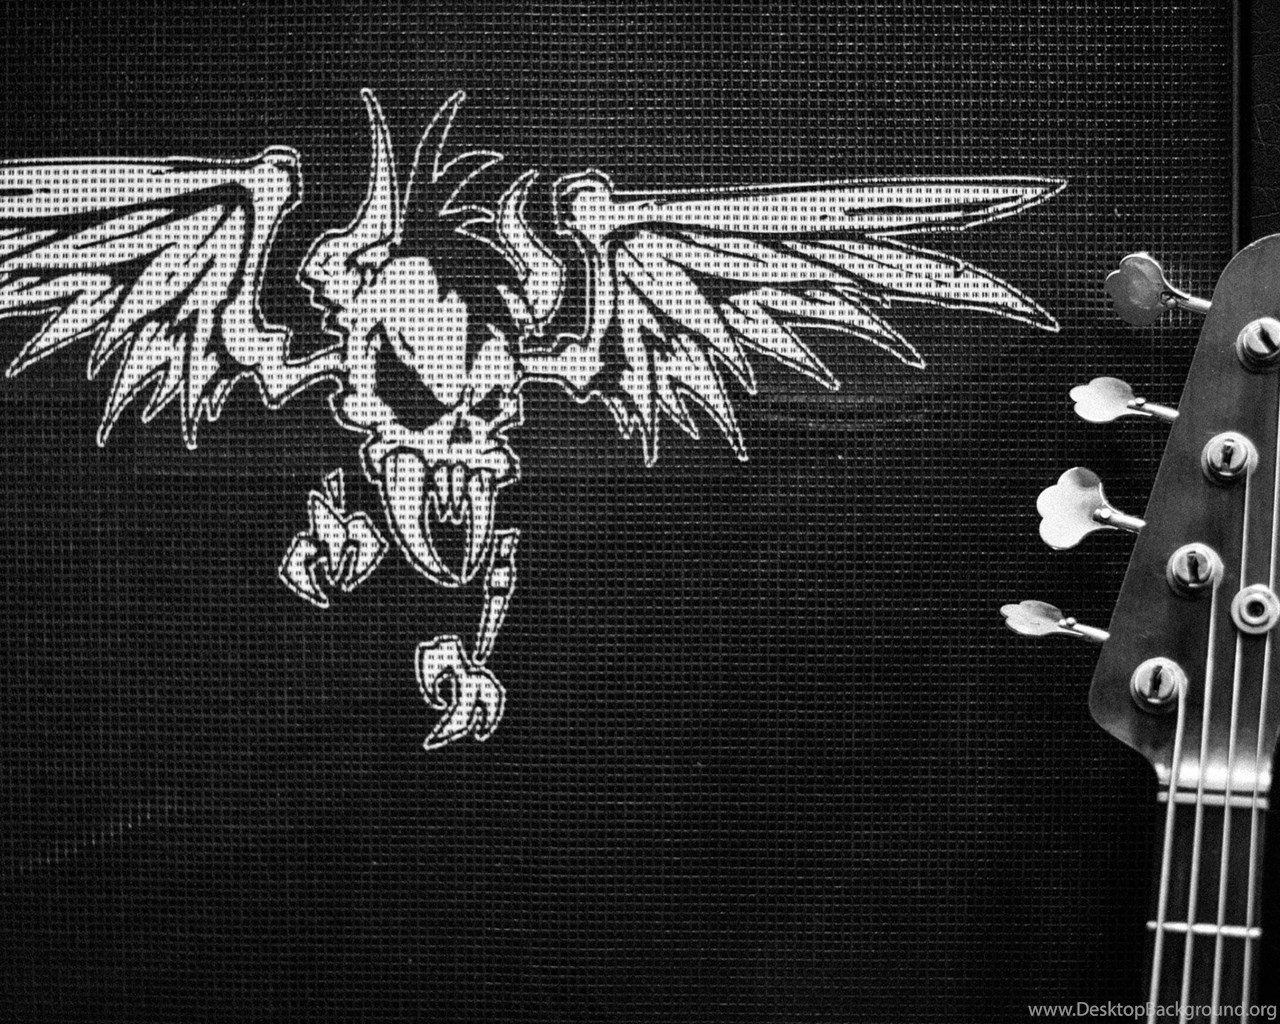 metallica thrash metal heavy rock poster guitar wallpapers